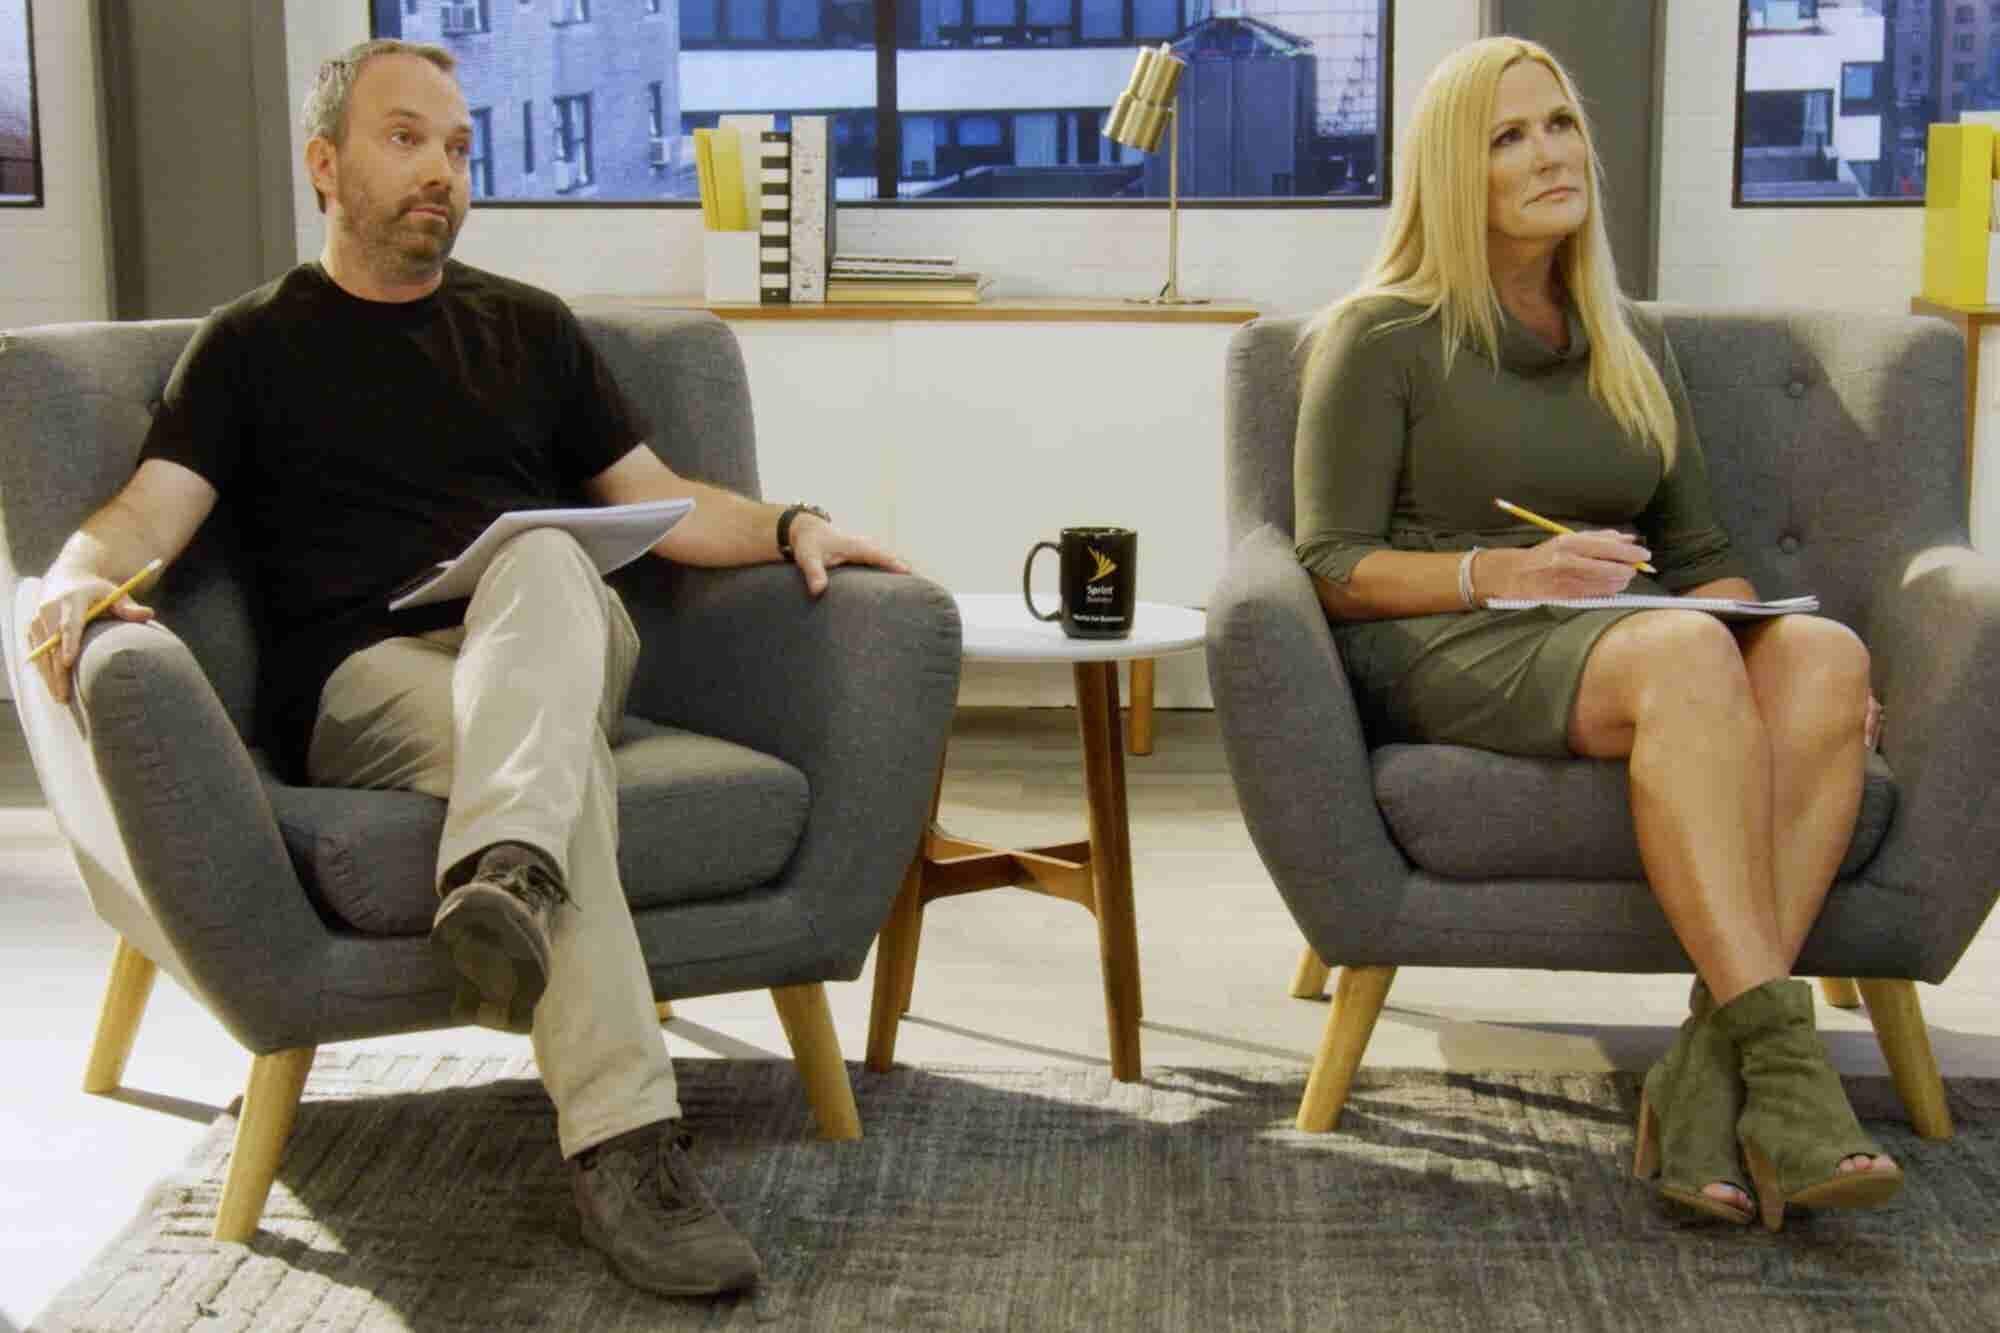 Entrepreneur Elevator Pitch Season 3 Episode 7: Is There Actually a Bu...